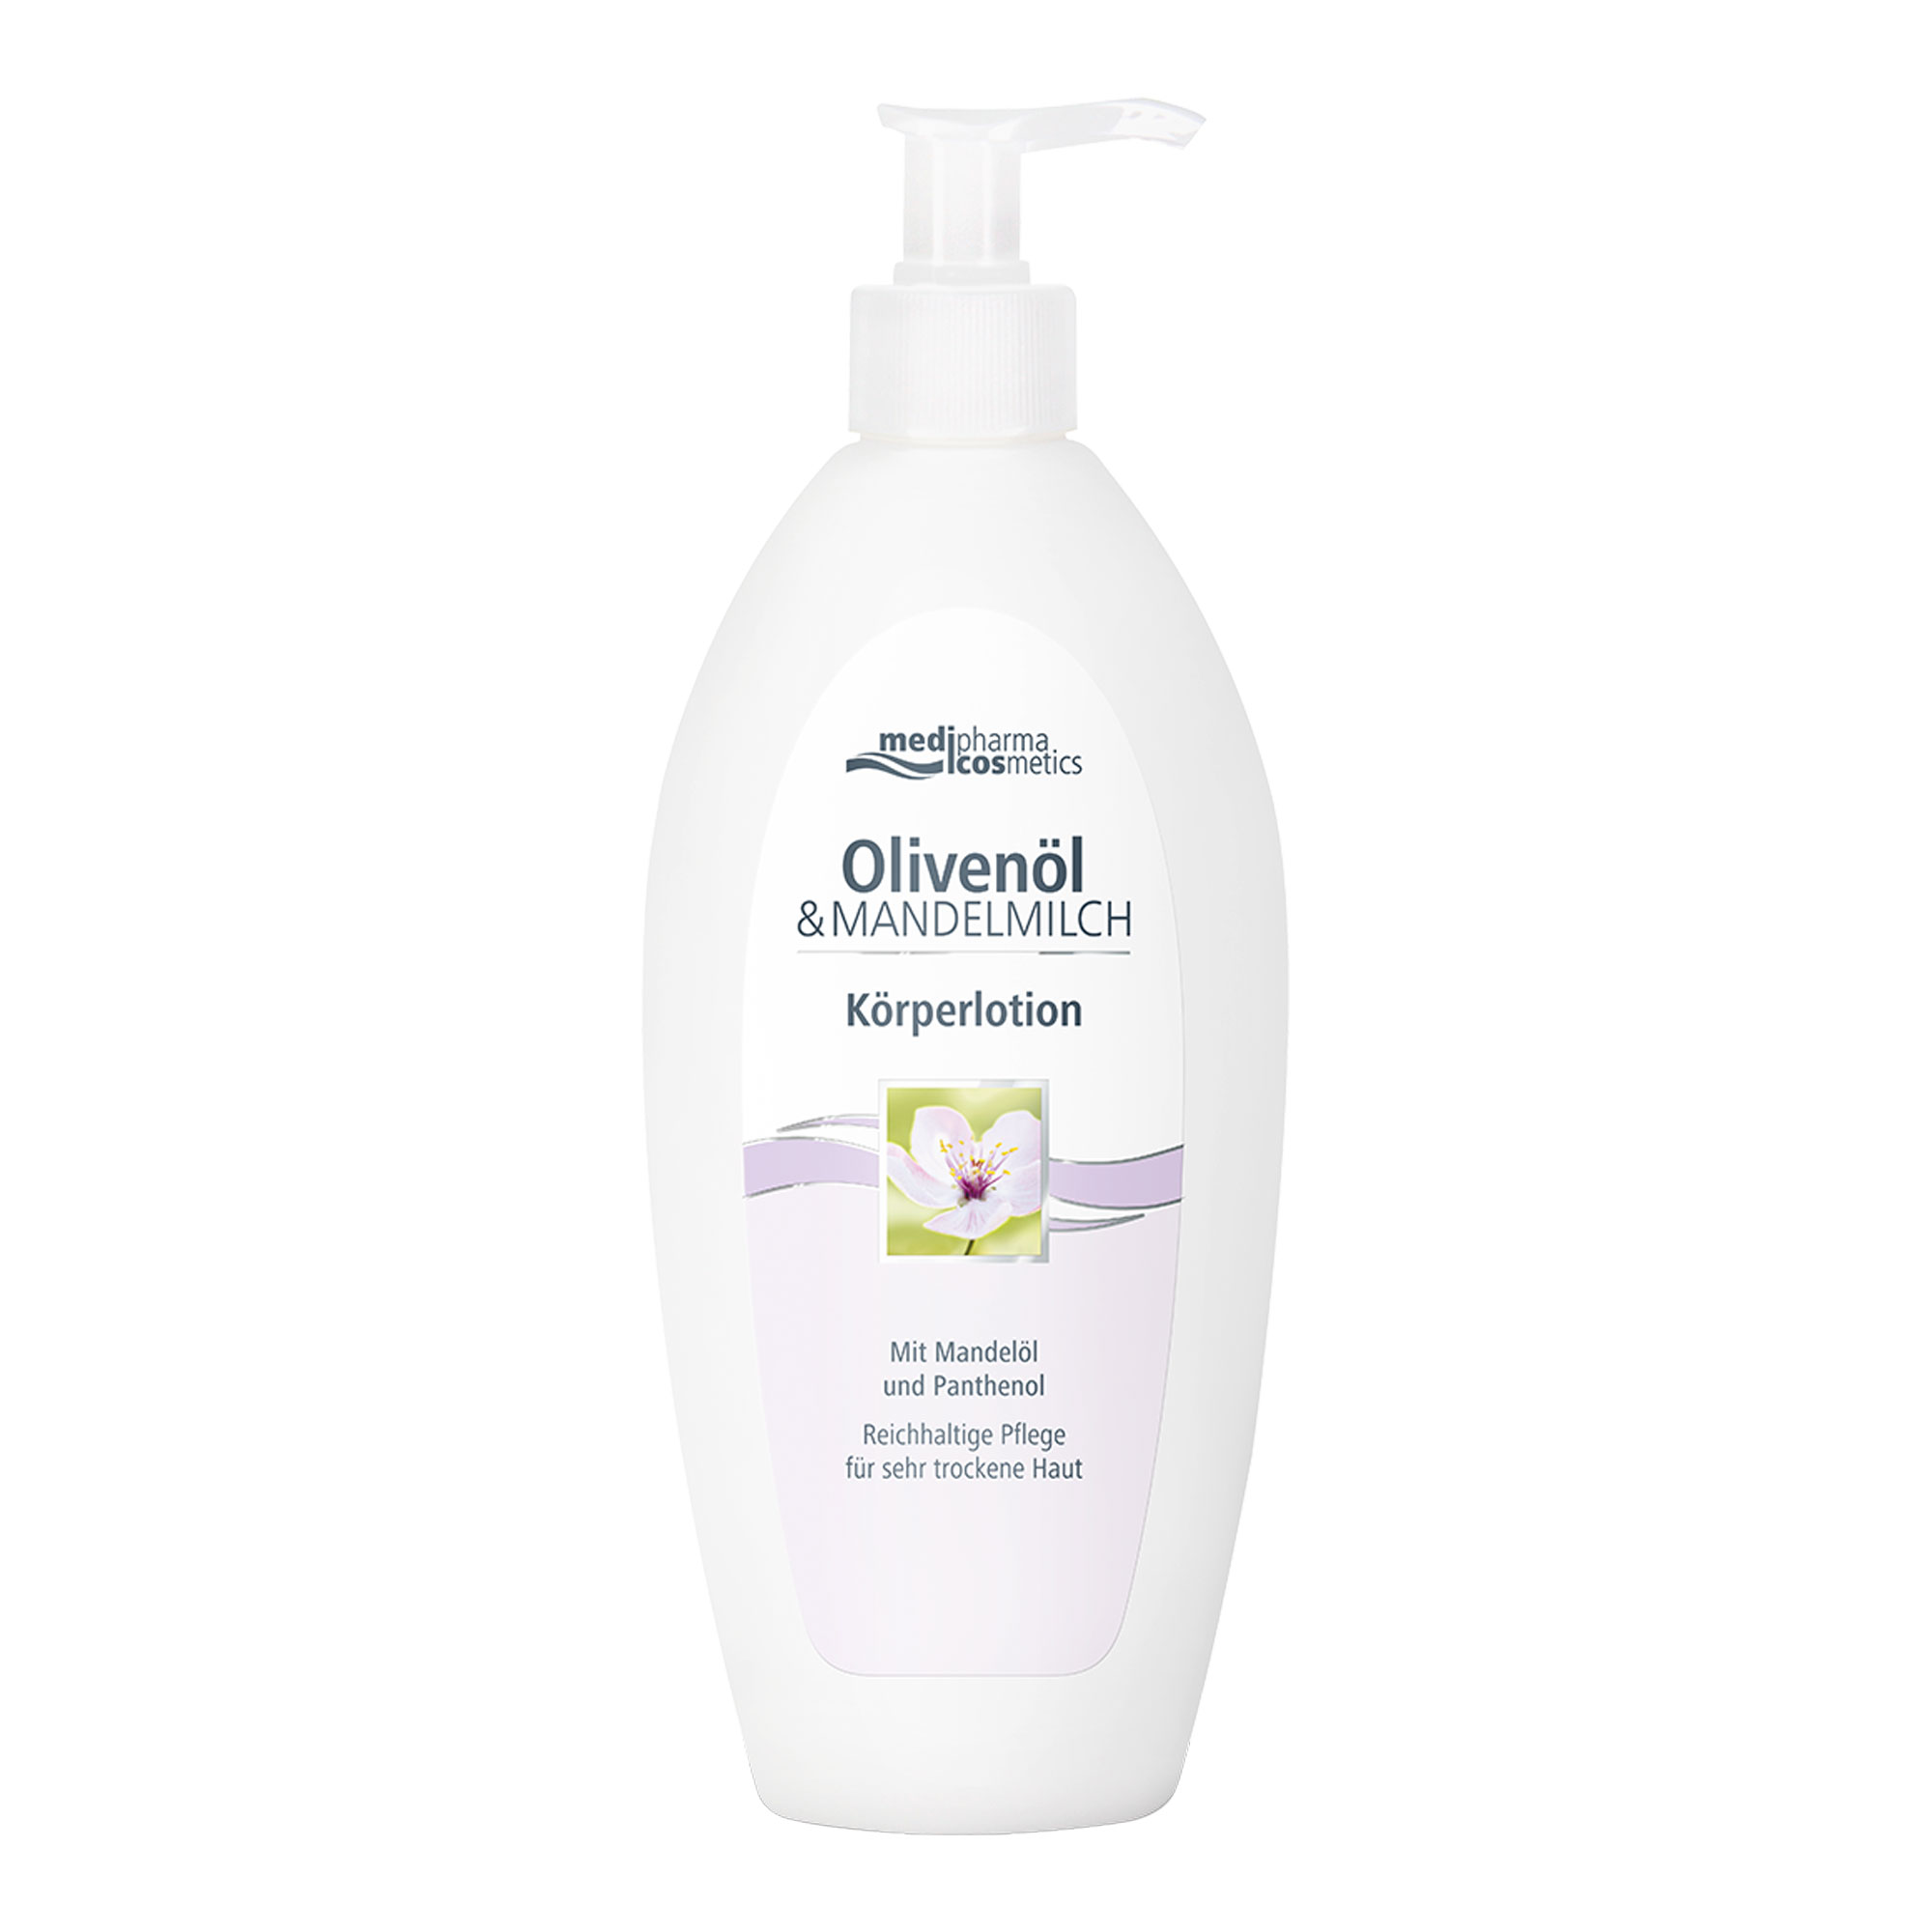 Olivenöl Mandelmilch Körperlotion